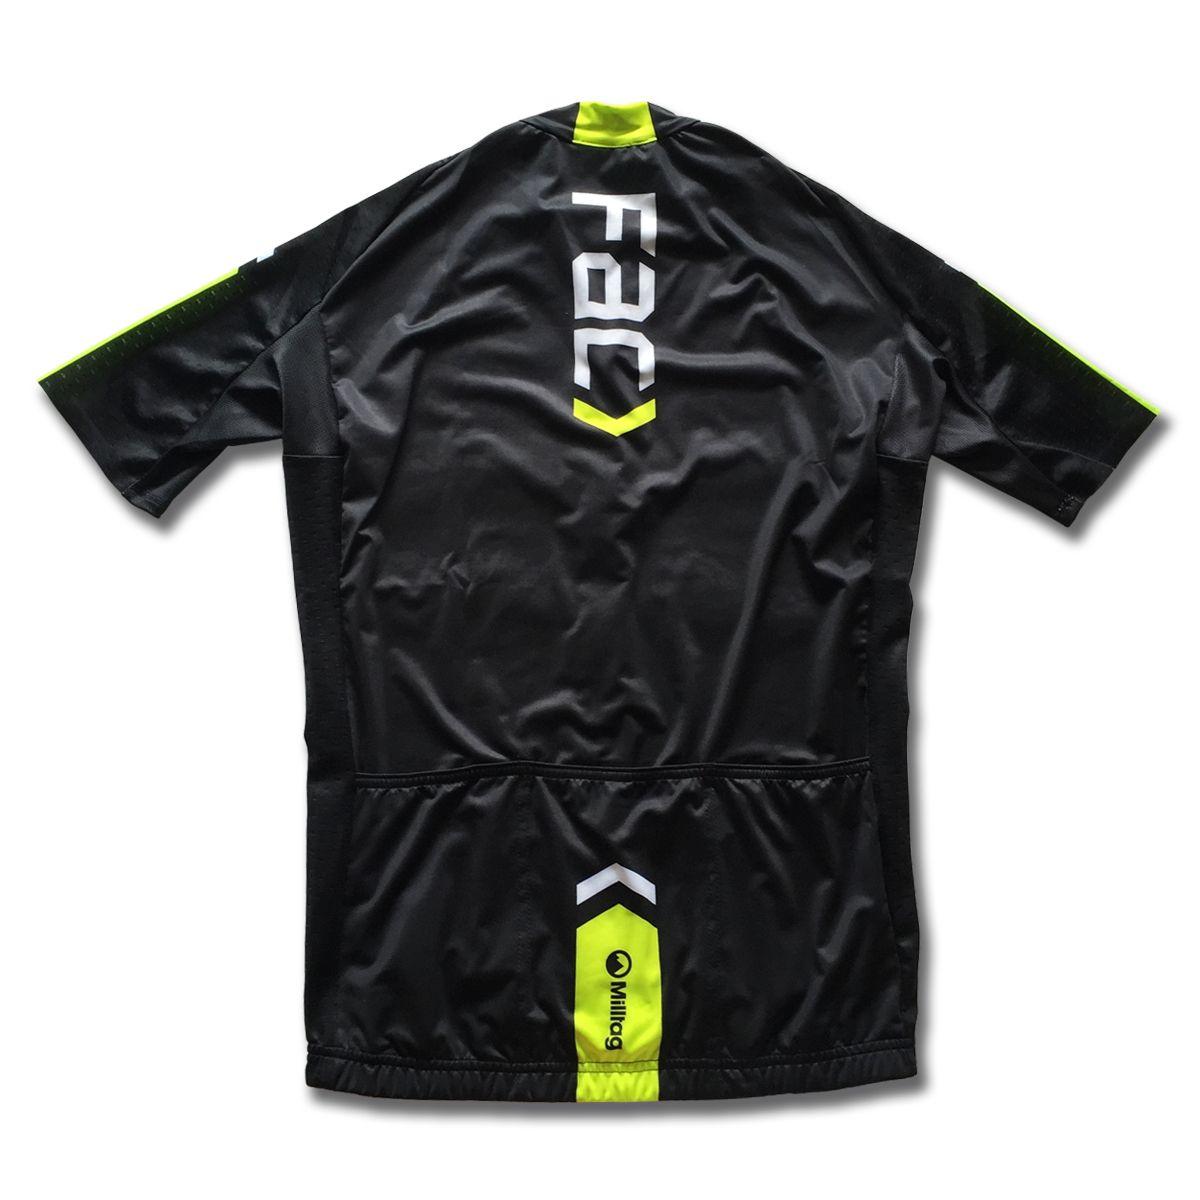 American Pro Rider T-shirt